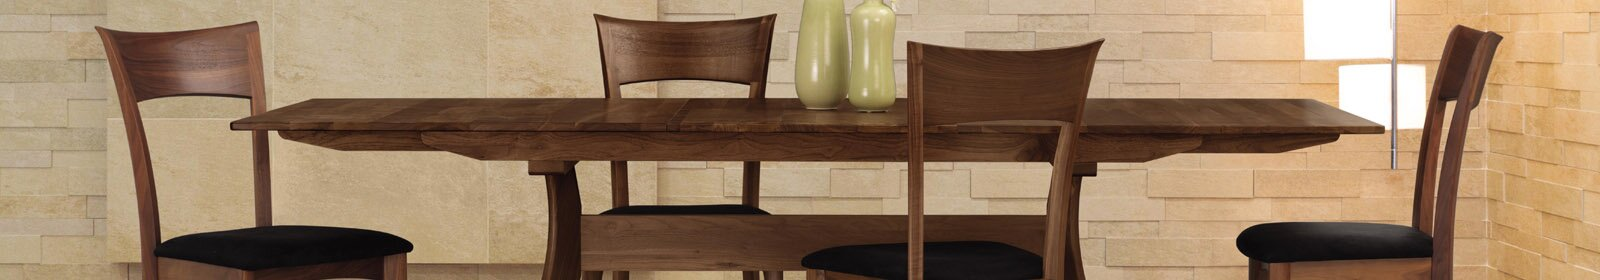 Copeland Furniture Wayfair